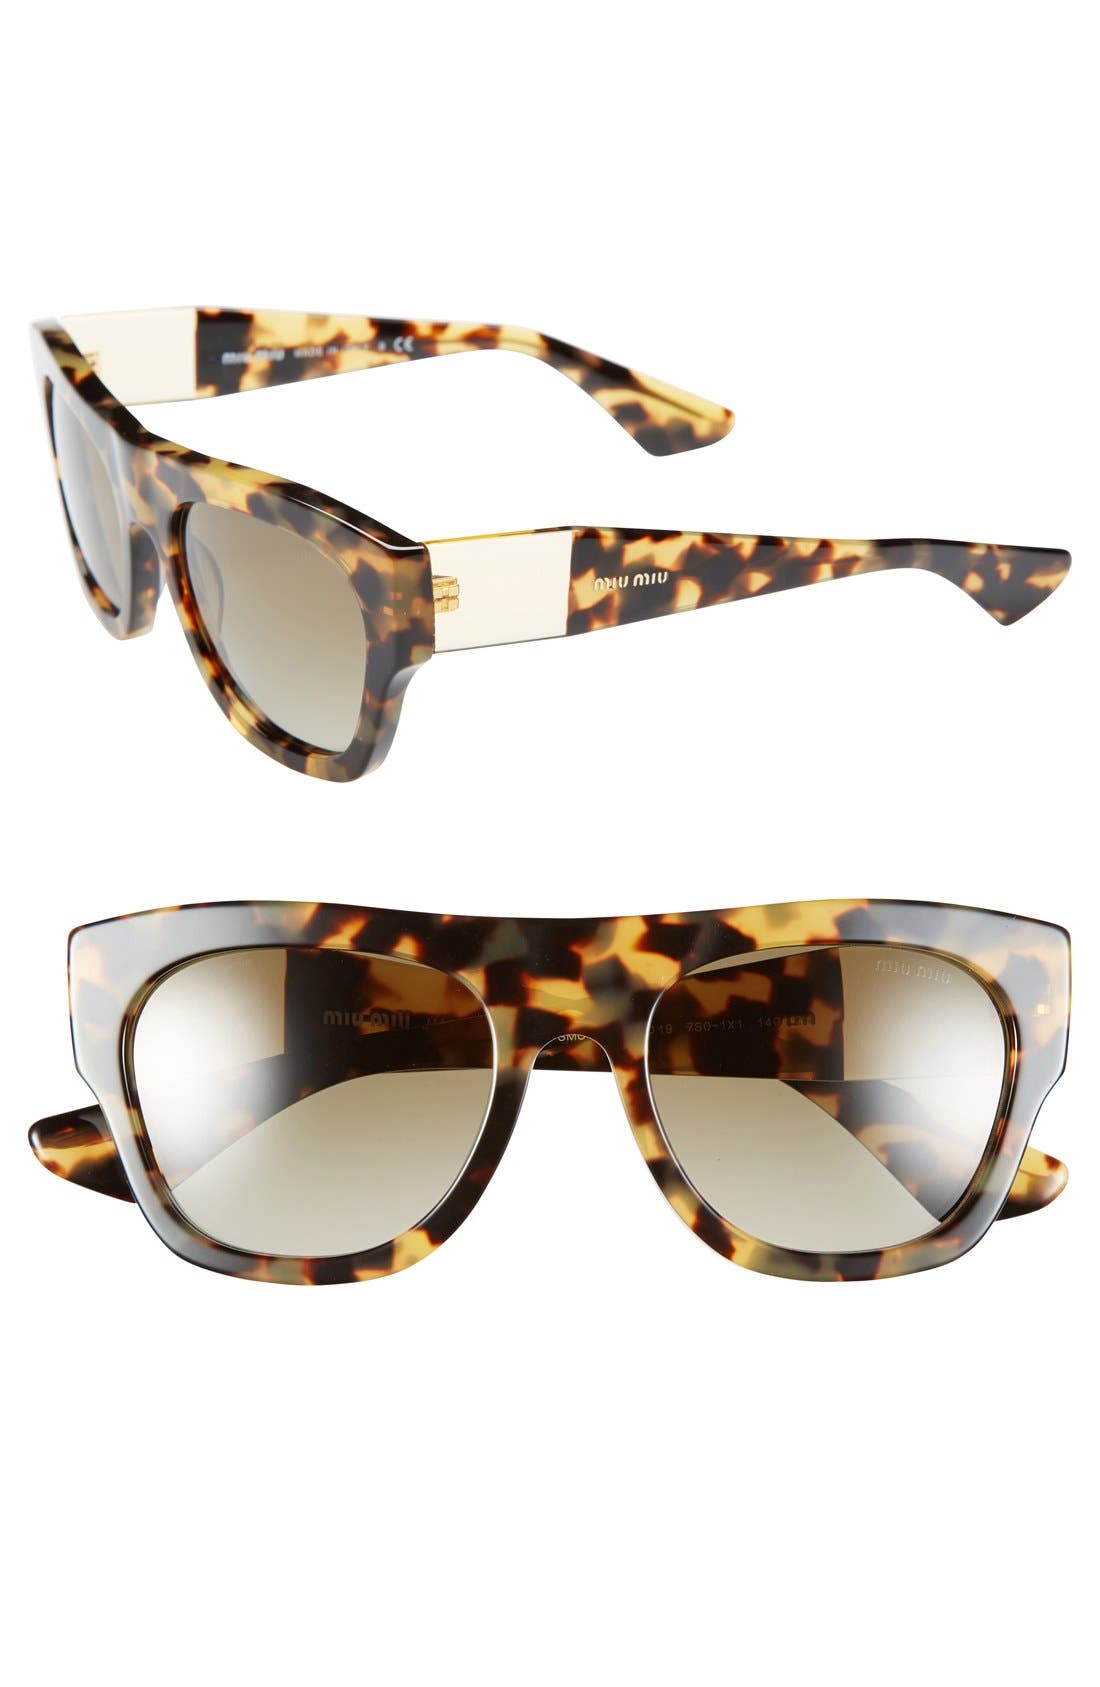 Alternate Image 1 Selected - Miu Miu 52mm Retro Sunglasses